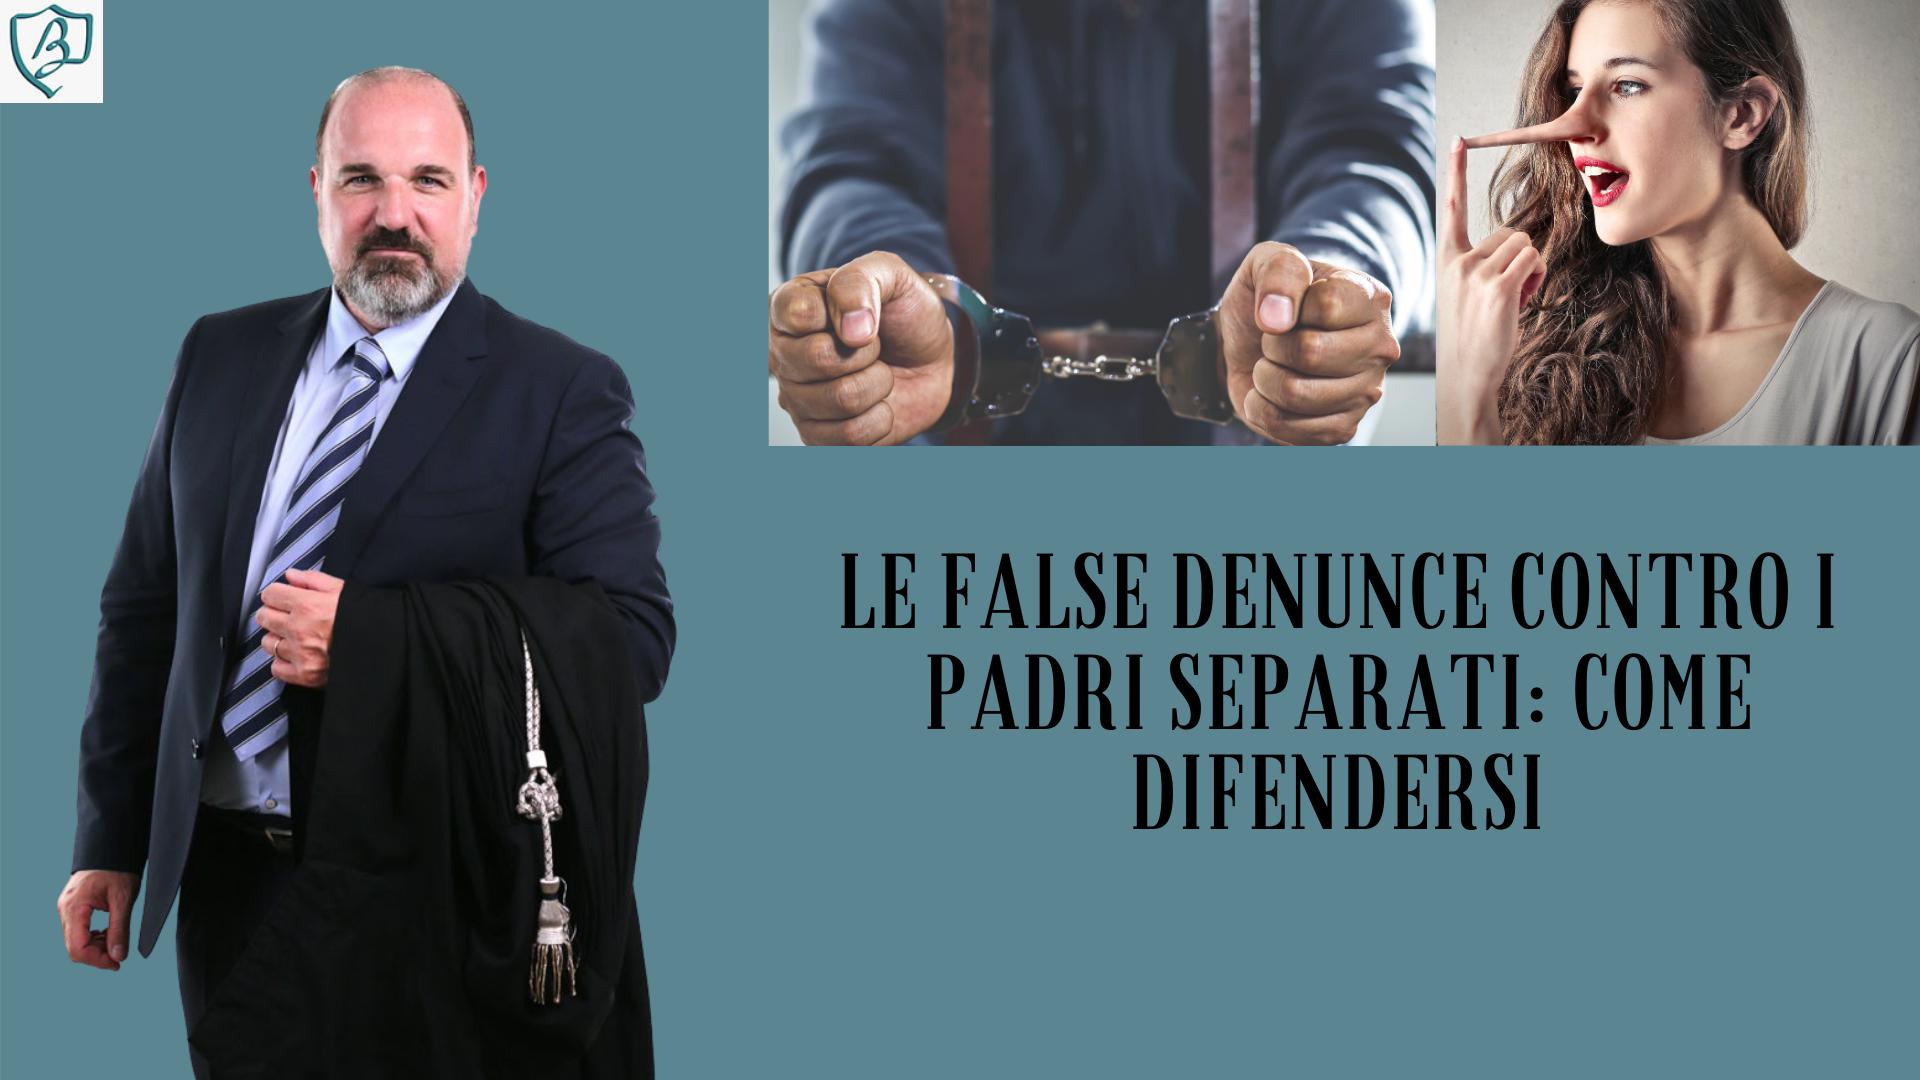 False denunce contro i padri separati